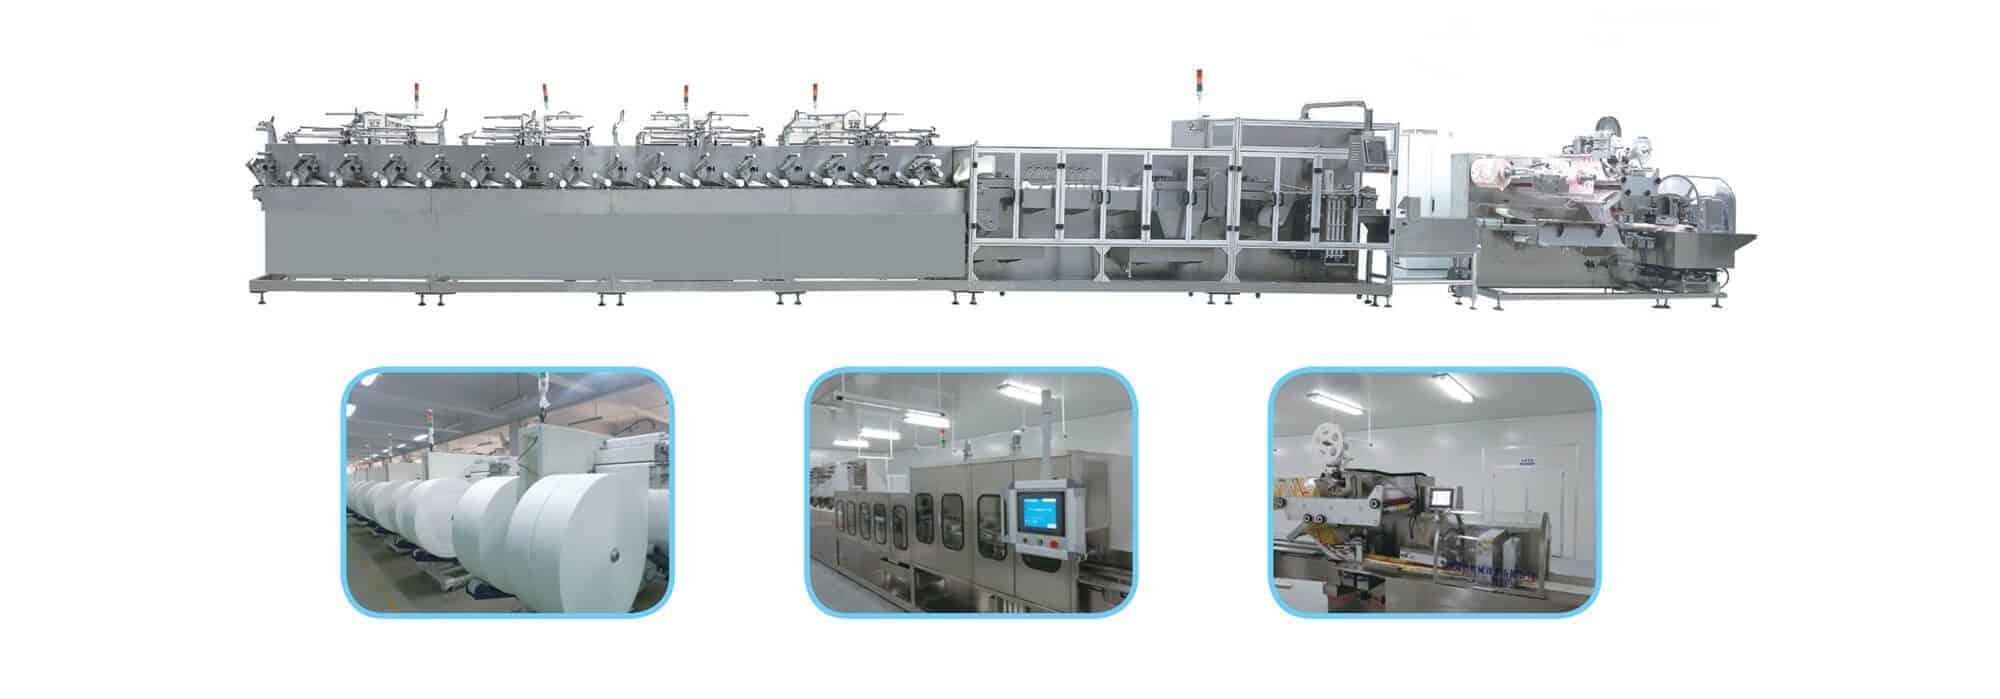 UT BM1620 - UT-BM16(20) Automatic baby wipes production line (30-120pcs/pack